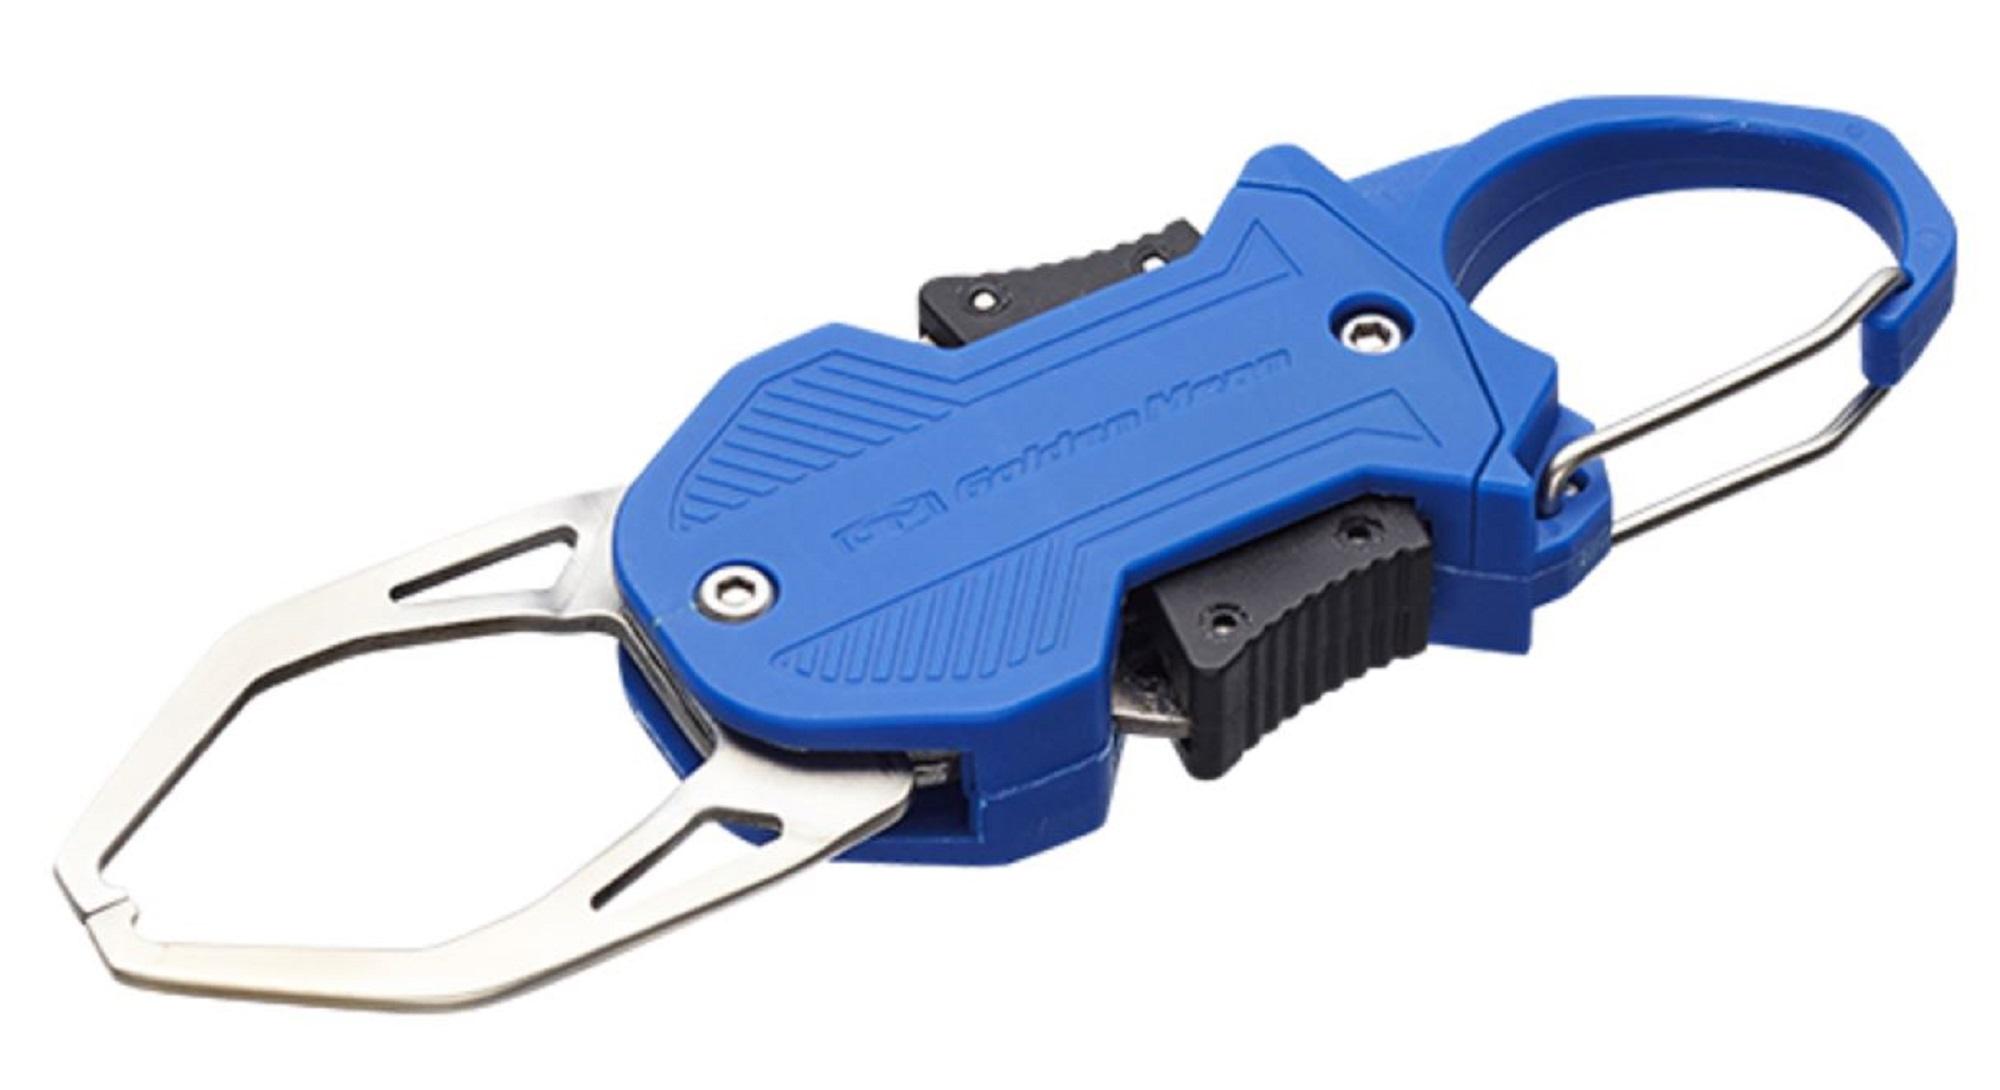 Golden Mean Grip Mini LT Fish Grip 115 mm 130mm Blue (6730)